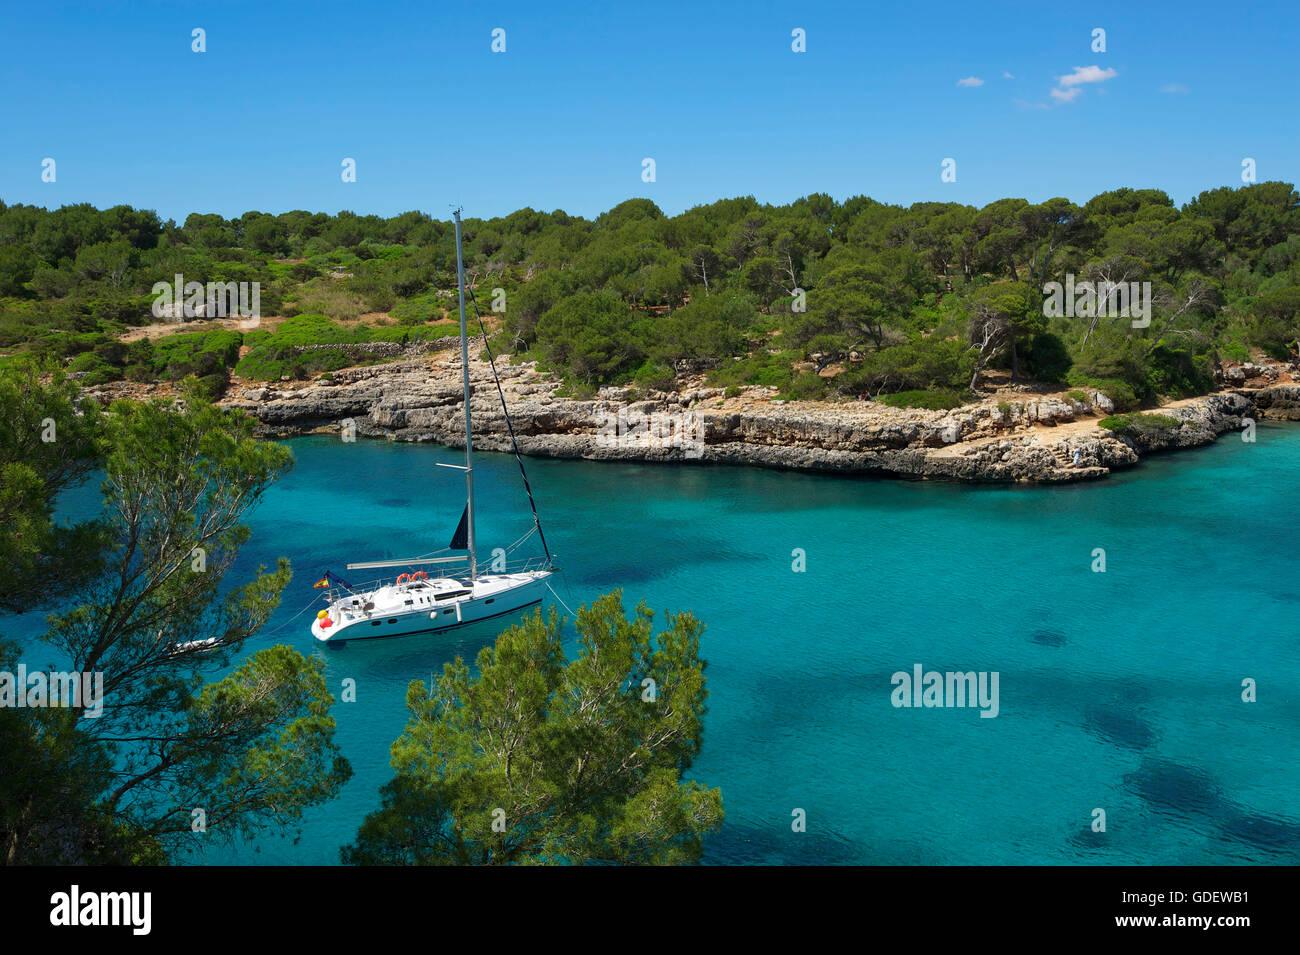 Cala Sa Nau, Majorca, Balearics, Spain - Stock Image